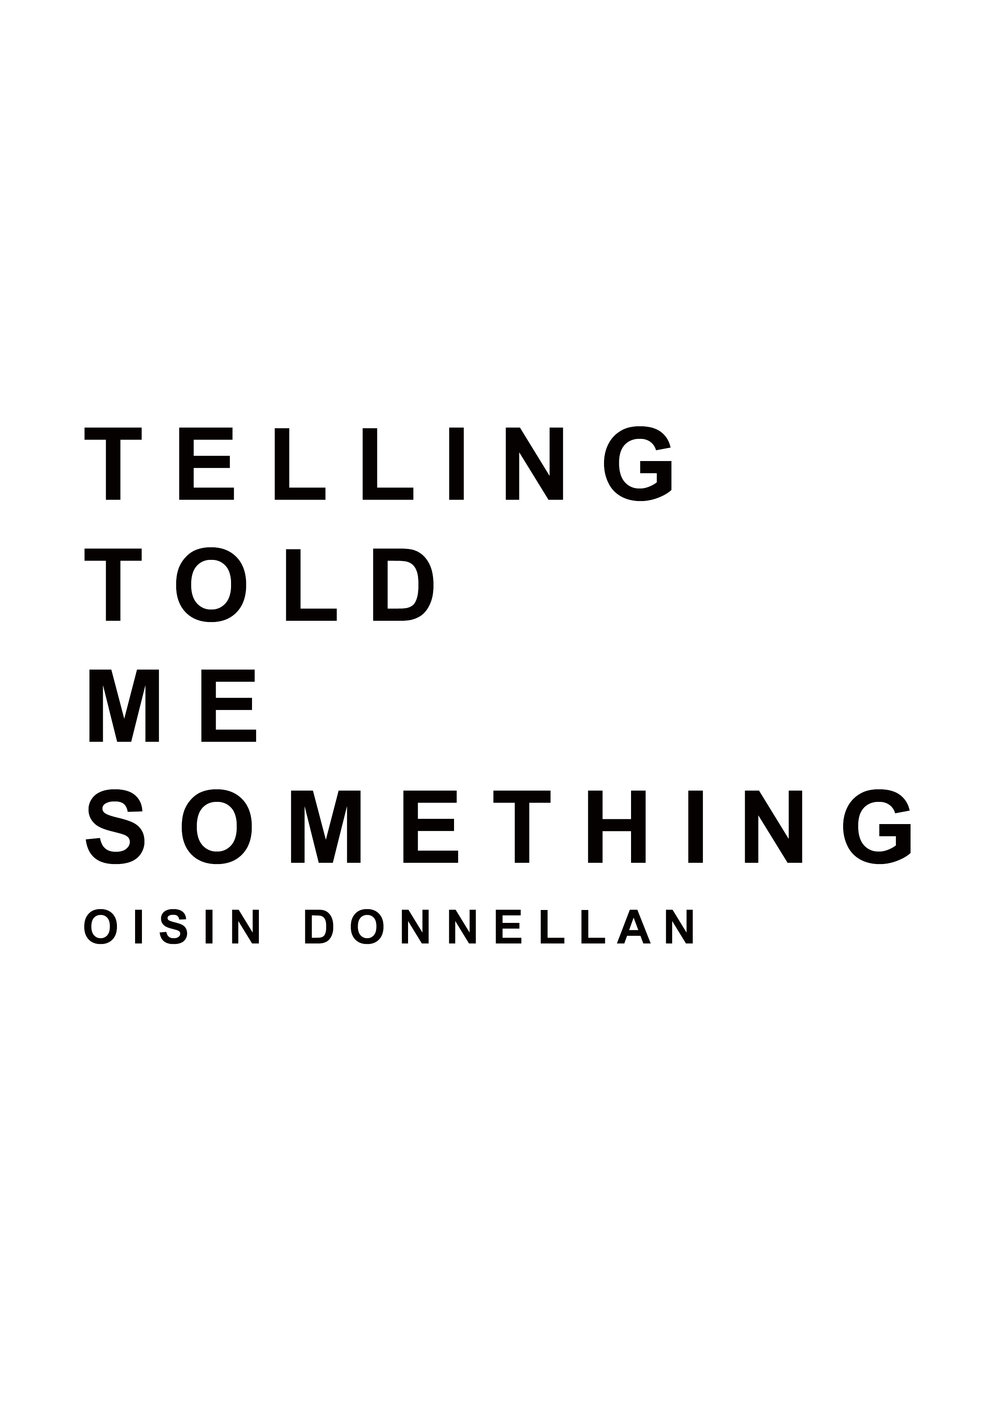 TELLING TOLD ME SOMETHING OISIN DONNELLAN.jpg